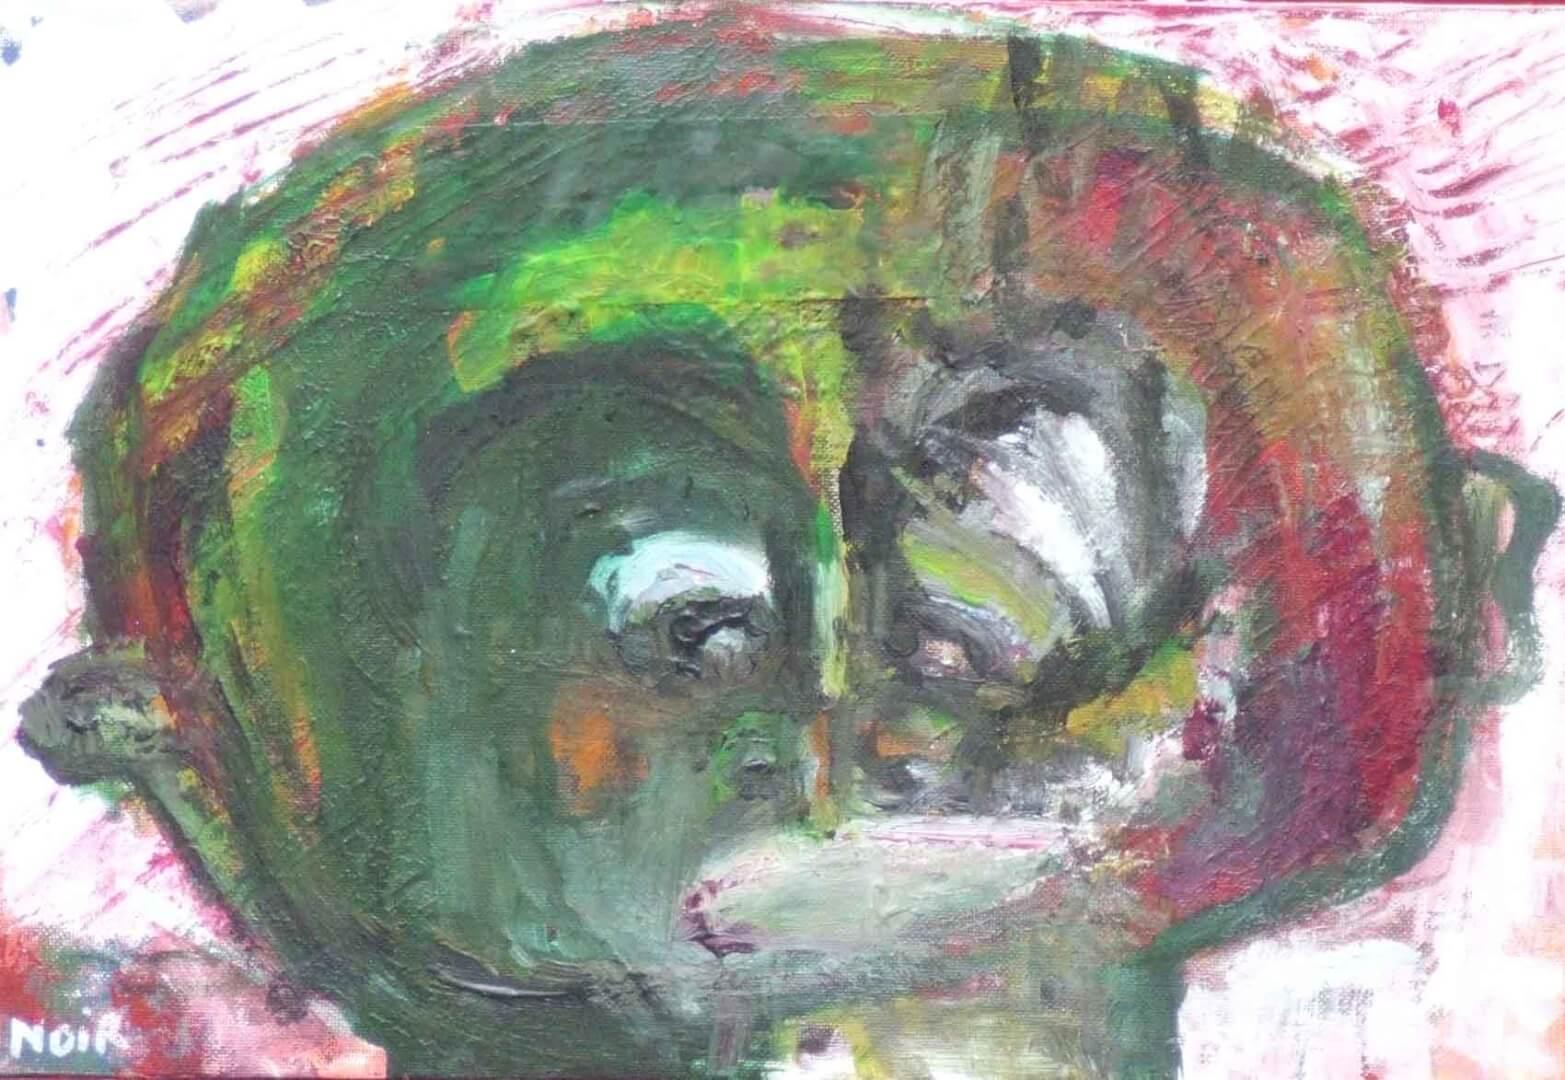 Grosse tête © David Noir | Dessins, peintures, collages